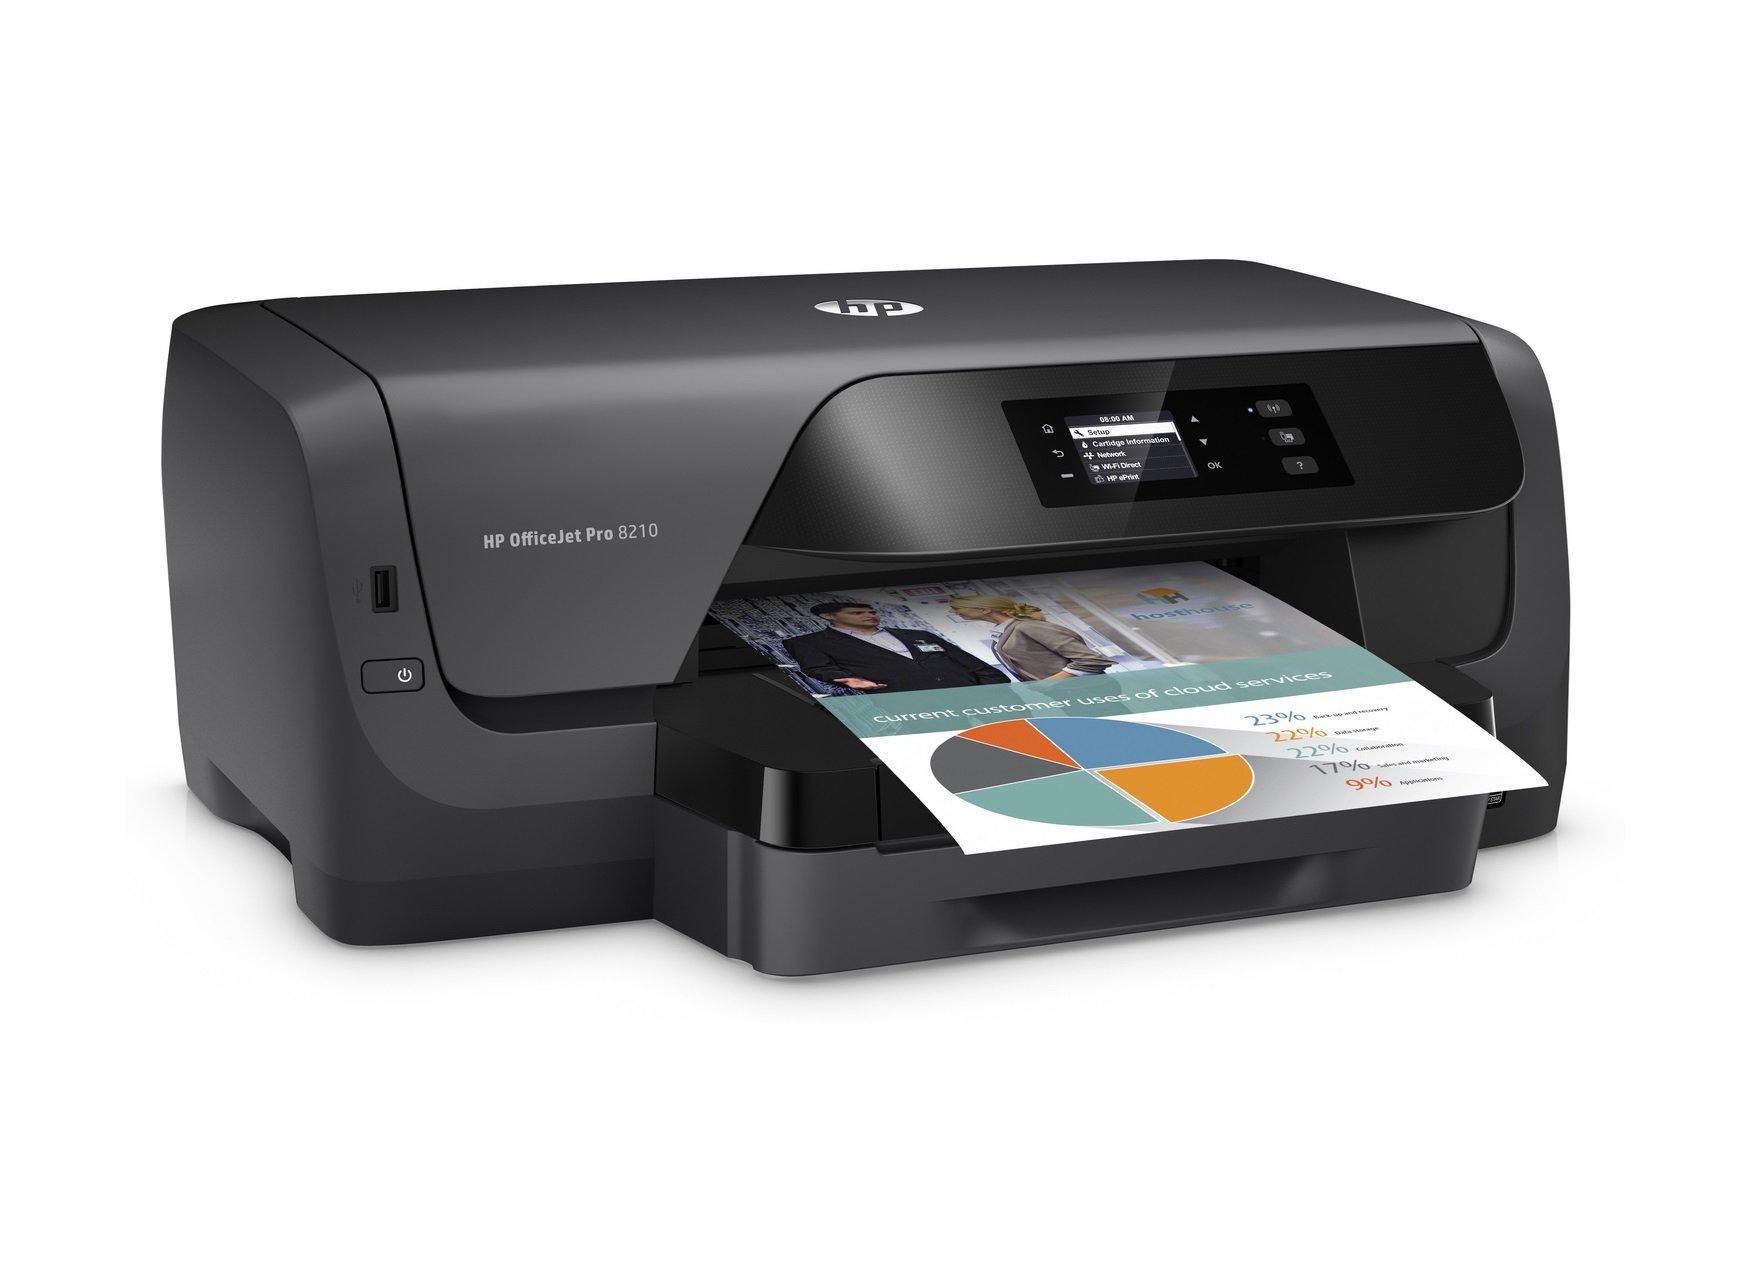 HP Stampante Officejet Pro 8210 ^